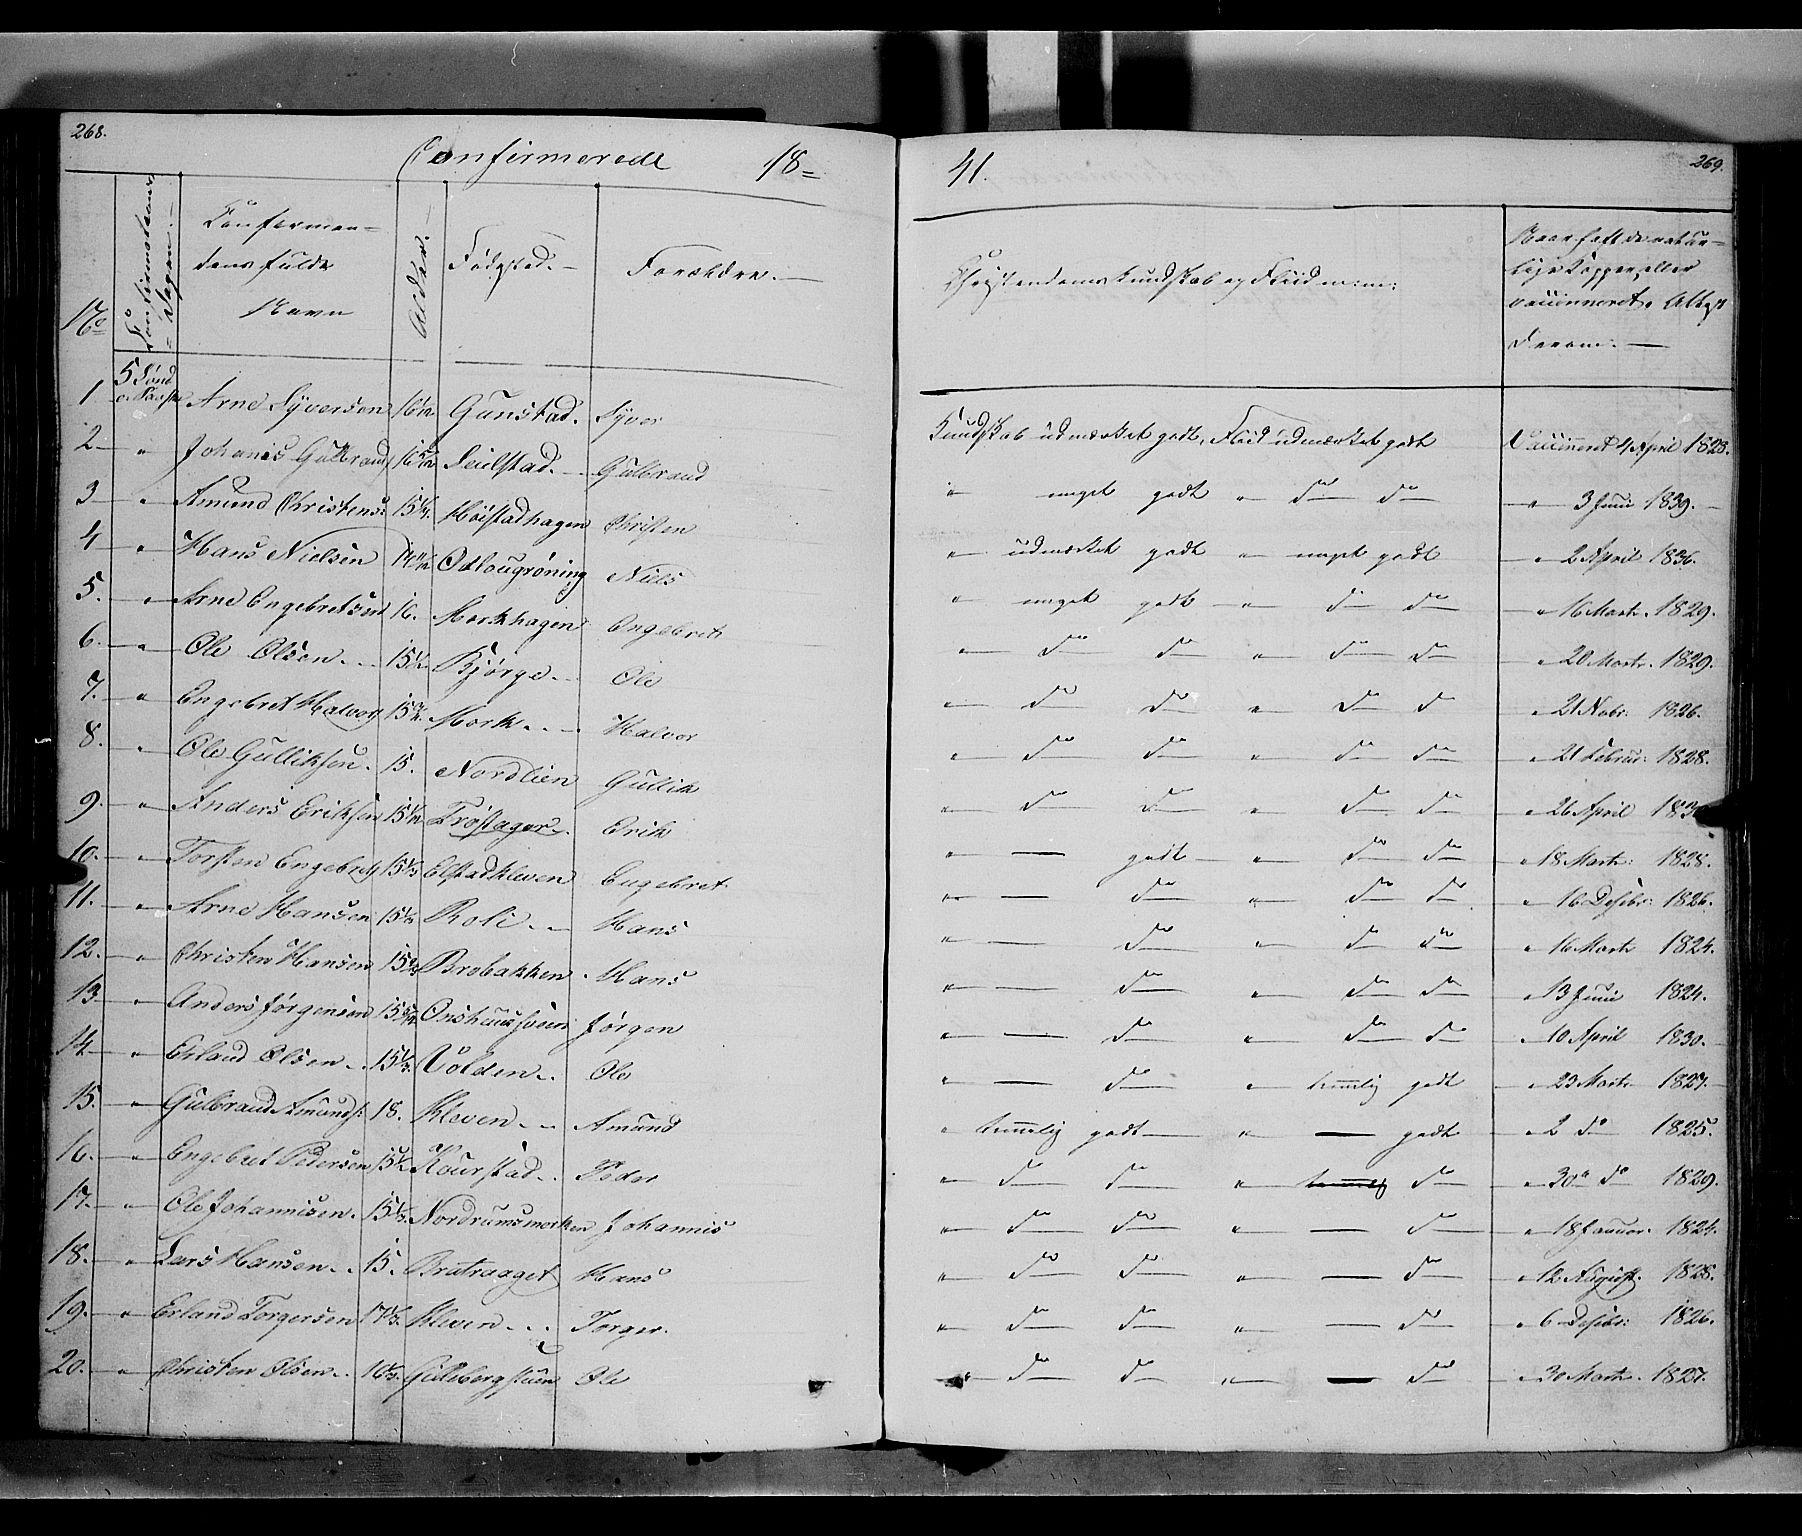 SAH, Ringebu prestekontor, Ministerialbok nr. 5, 1839-1848, s. 268-269